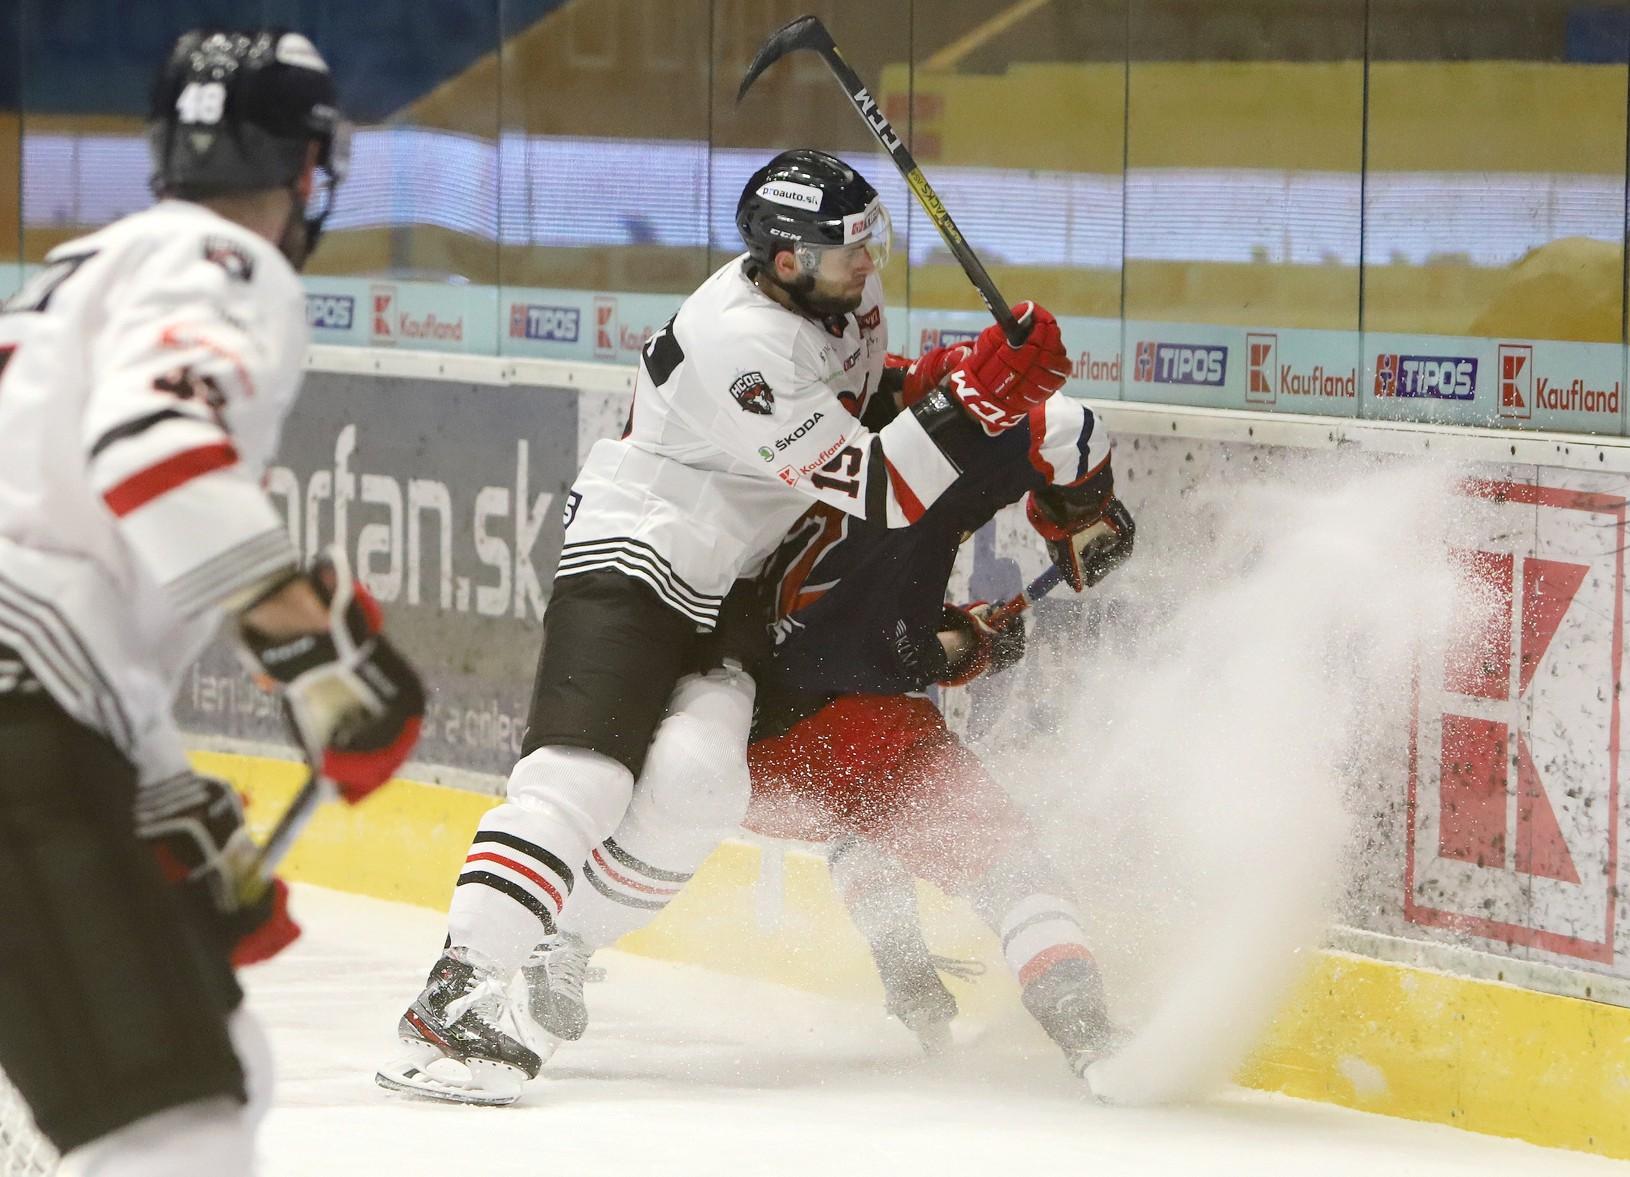 Momentka zo zápasu HC'05